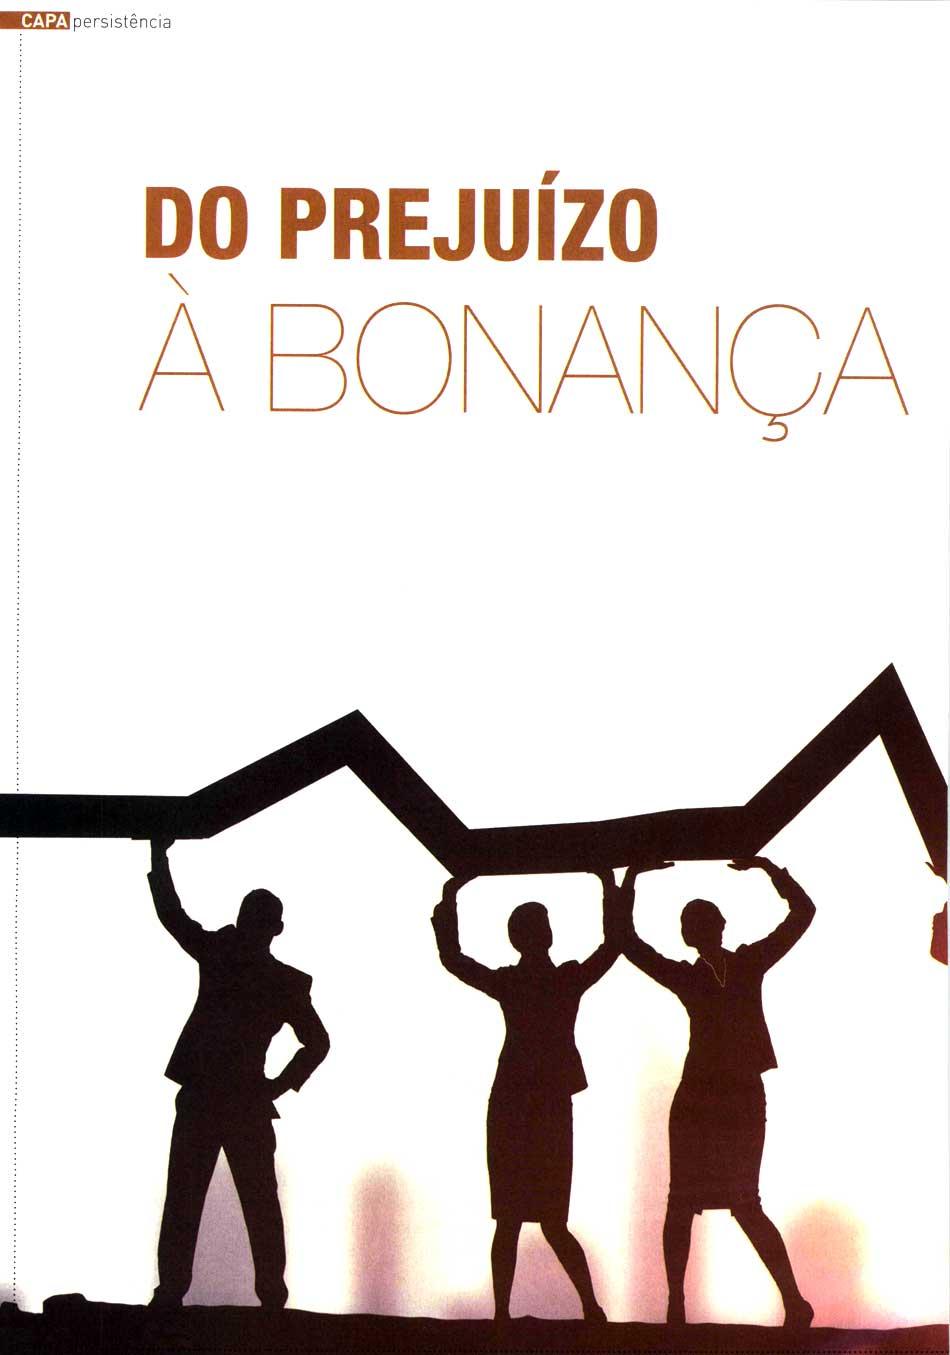 28_meu_proprio_negocio___sao_paulo___sp__2016_11_01-76850442a2d623b3b9f99826589bc6114eef10454513